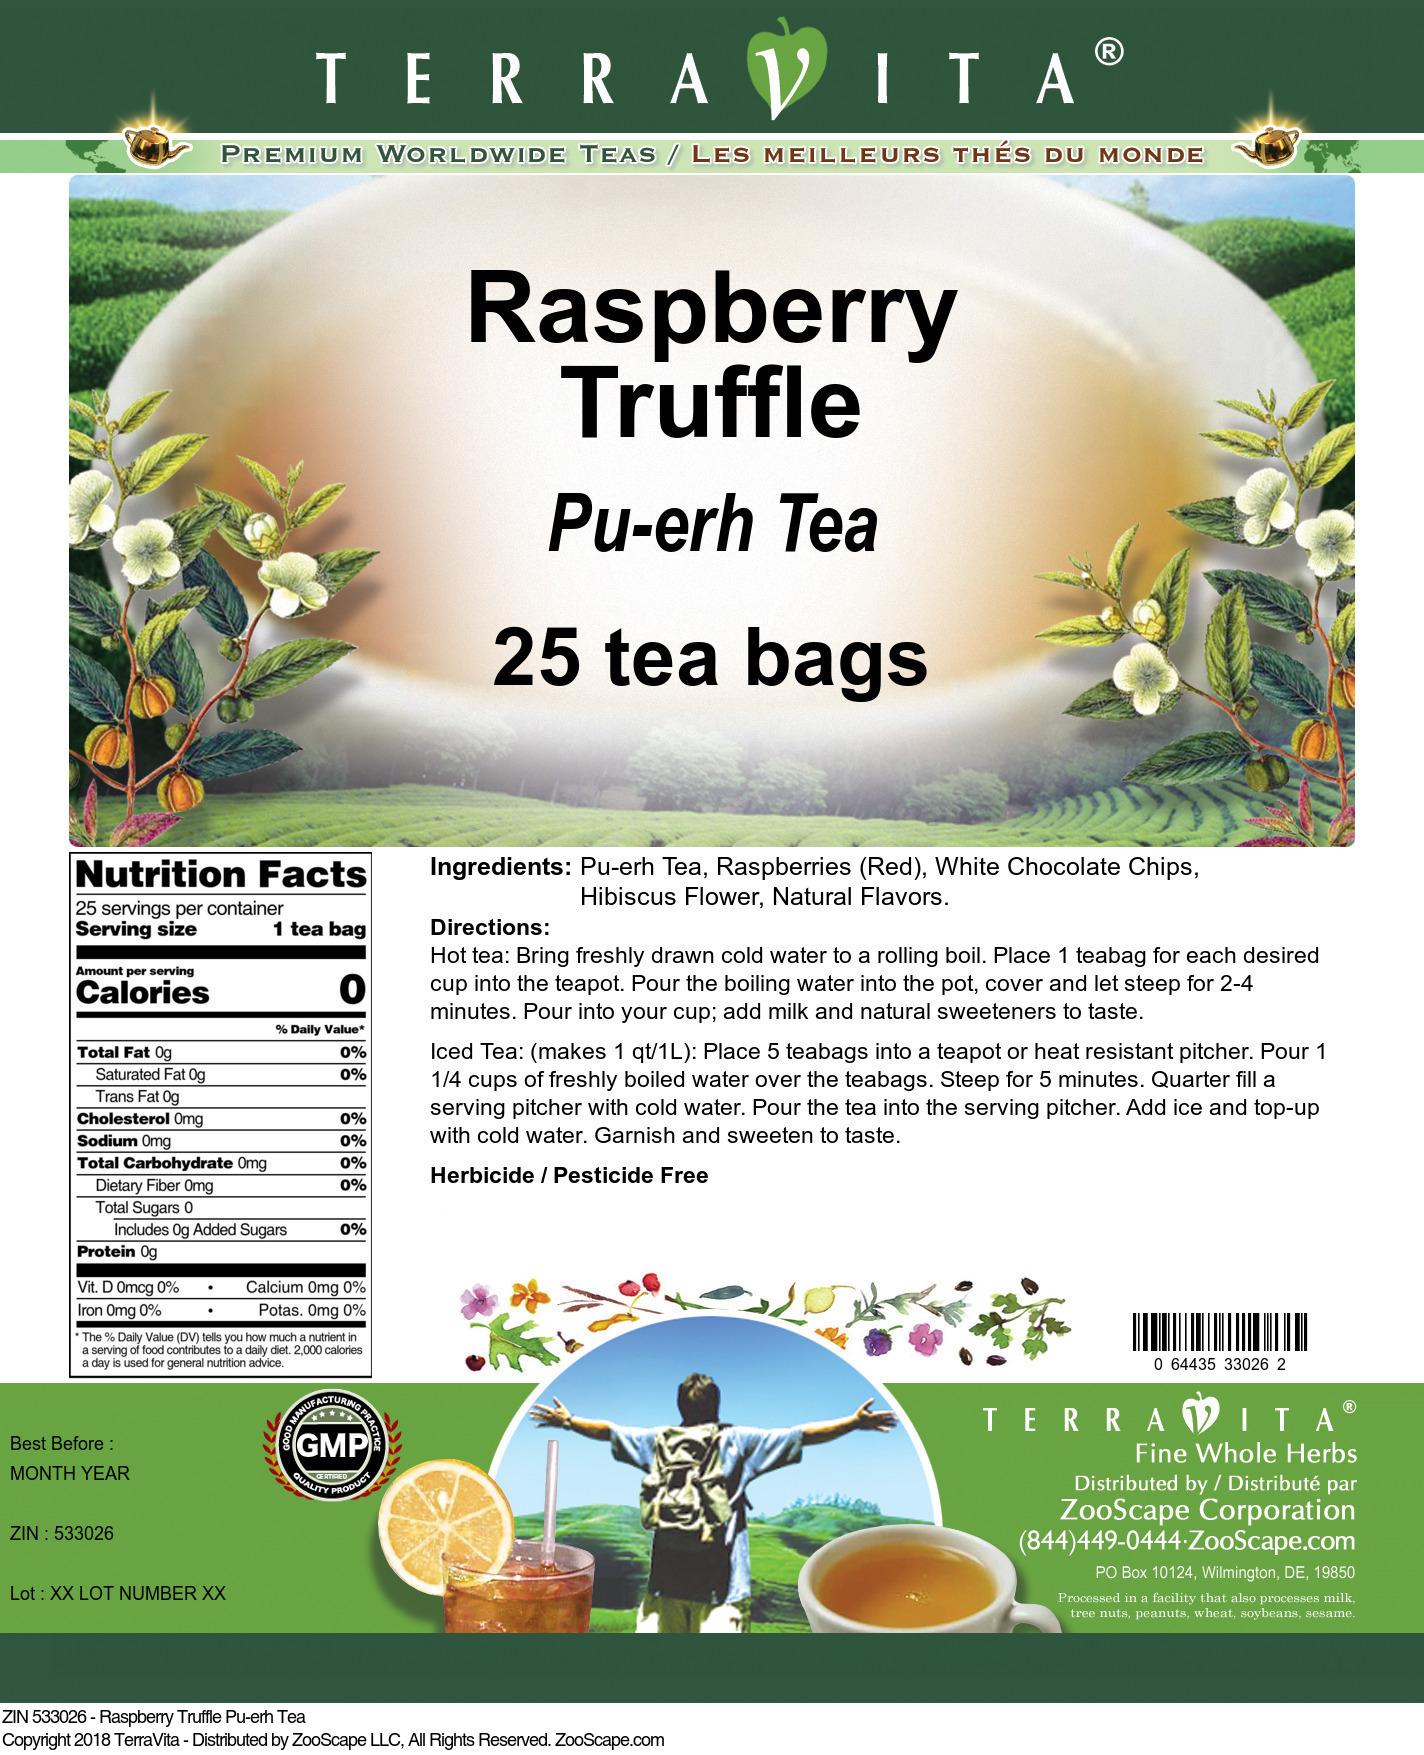 Raspberry Truffle Pu-erh Tea